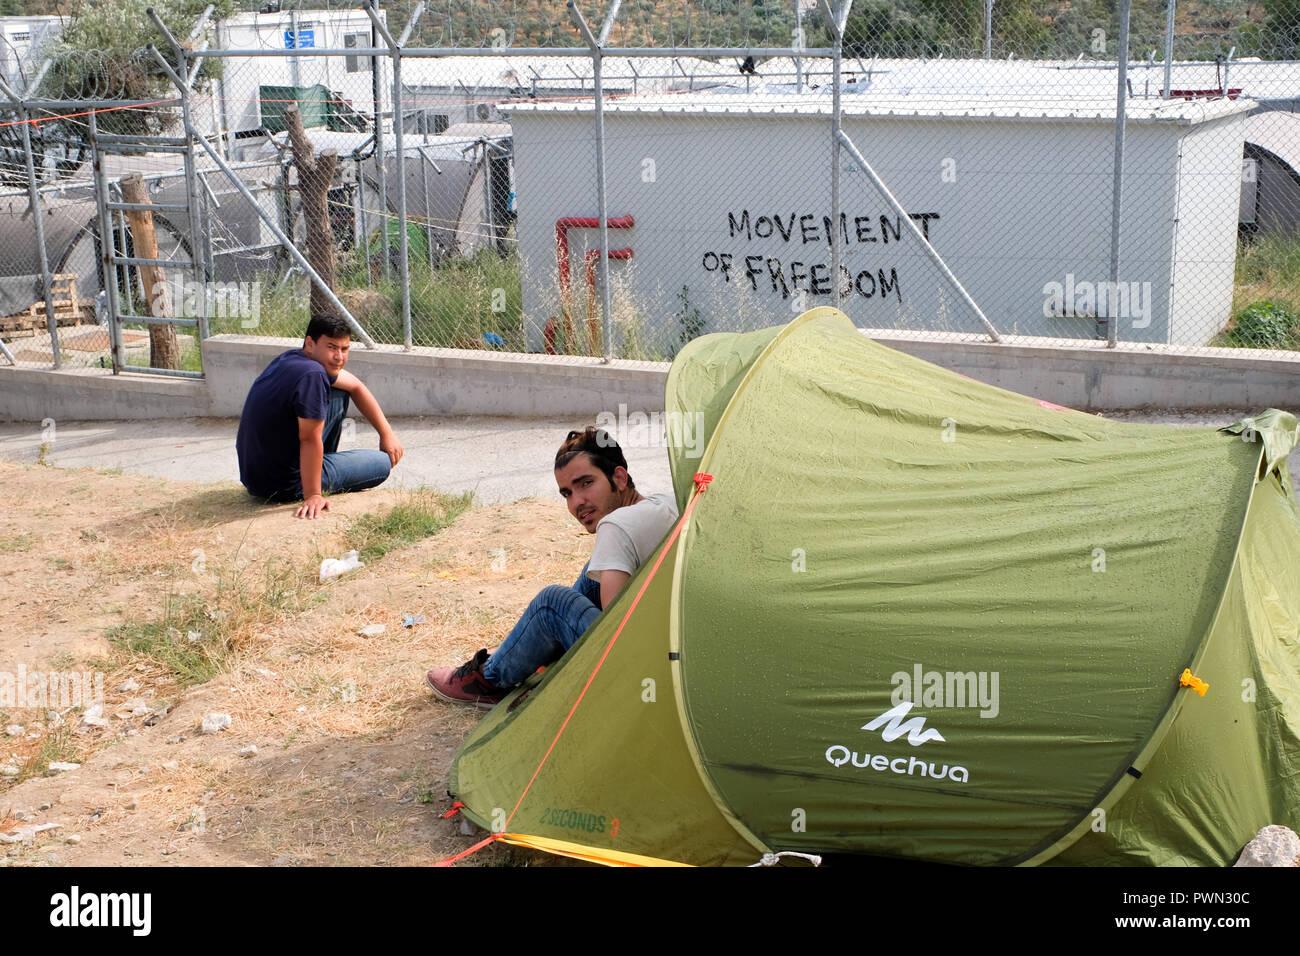 Tent in front of the MORIA CAMP for refugees. Island of Lesbos, Greece, May 2018 - Zelt vor dem MORIA CAMP für Flüchtlinge. Insel Lesbos, Griechenland, Mai 2018 - Stock Image